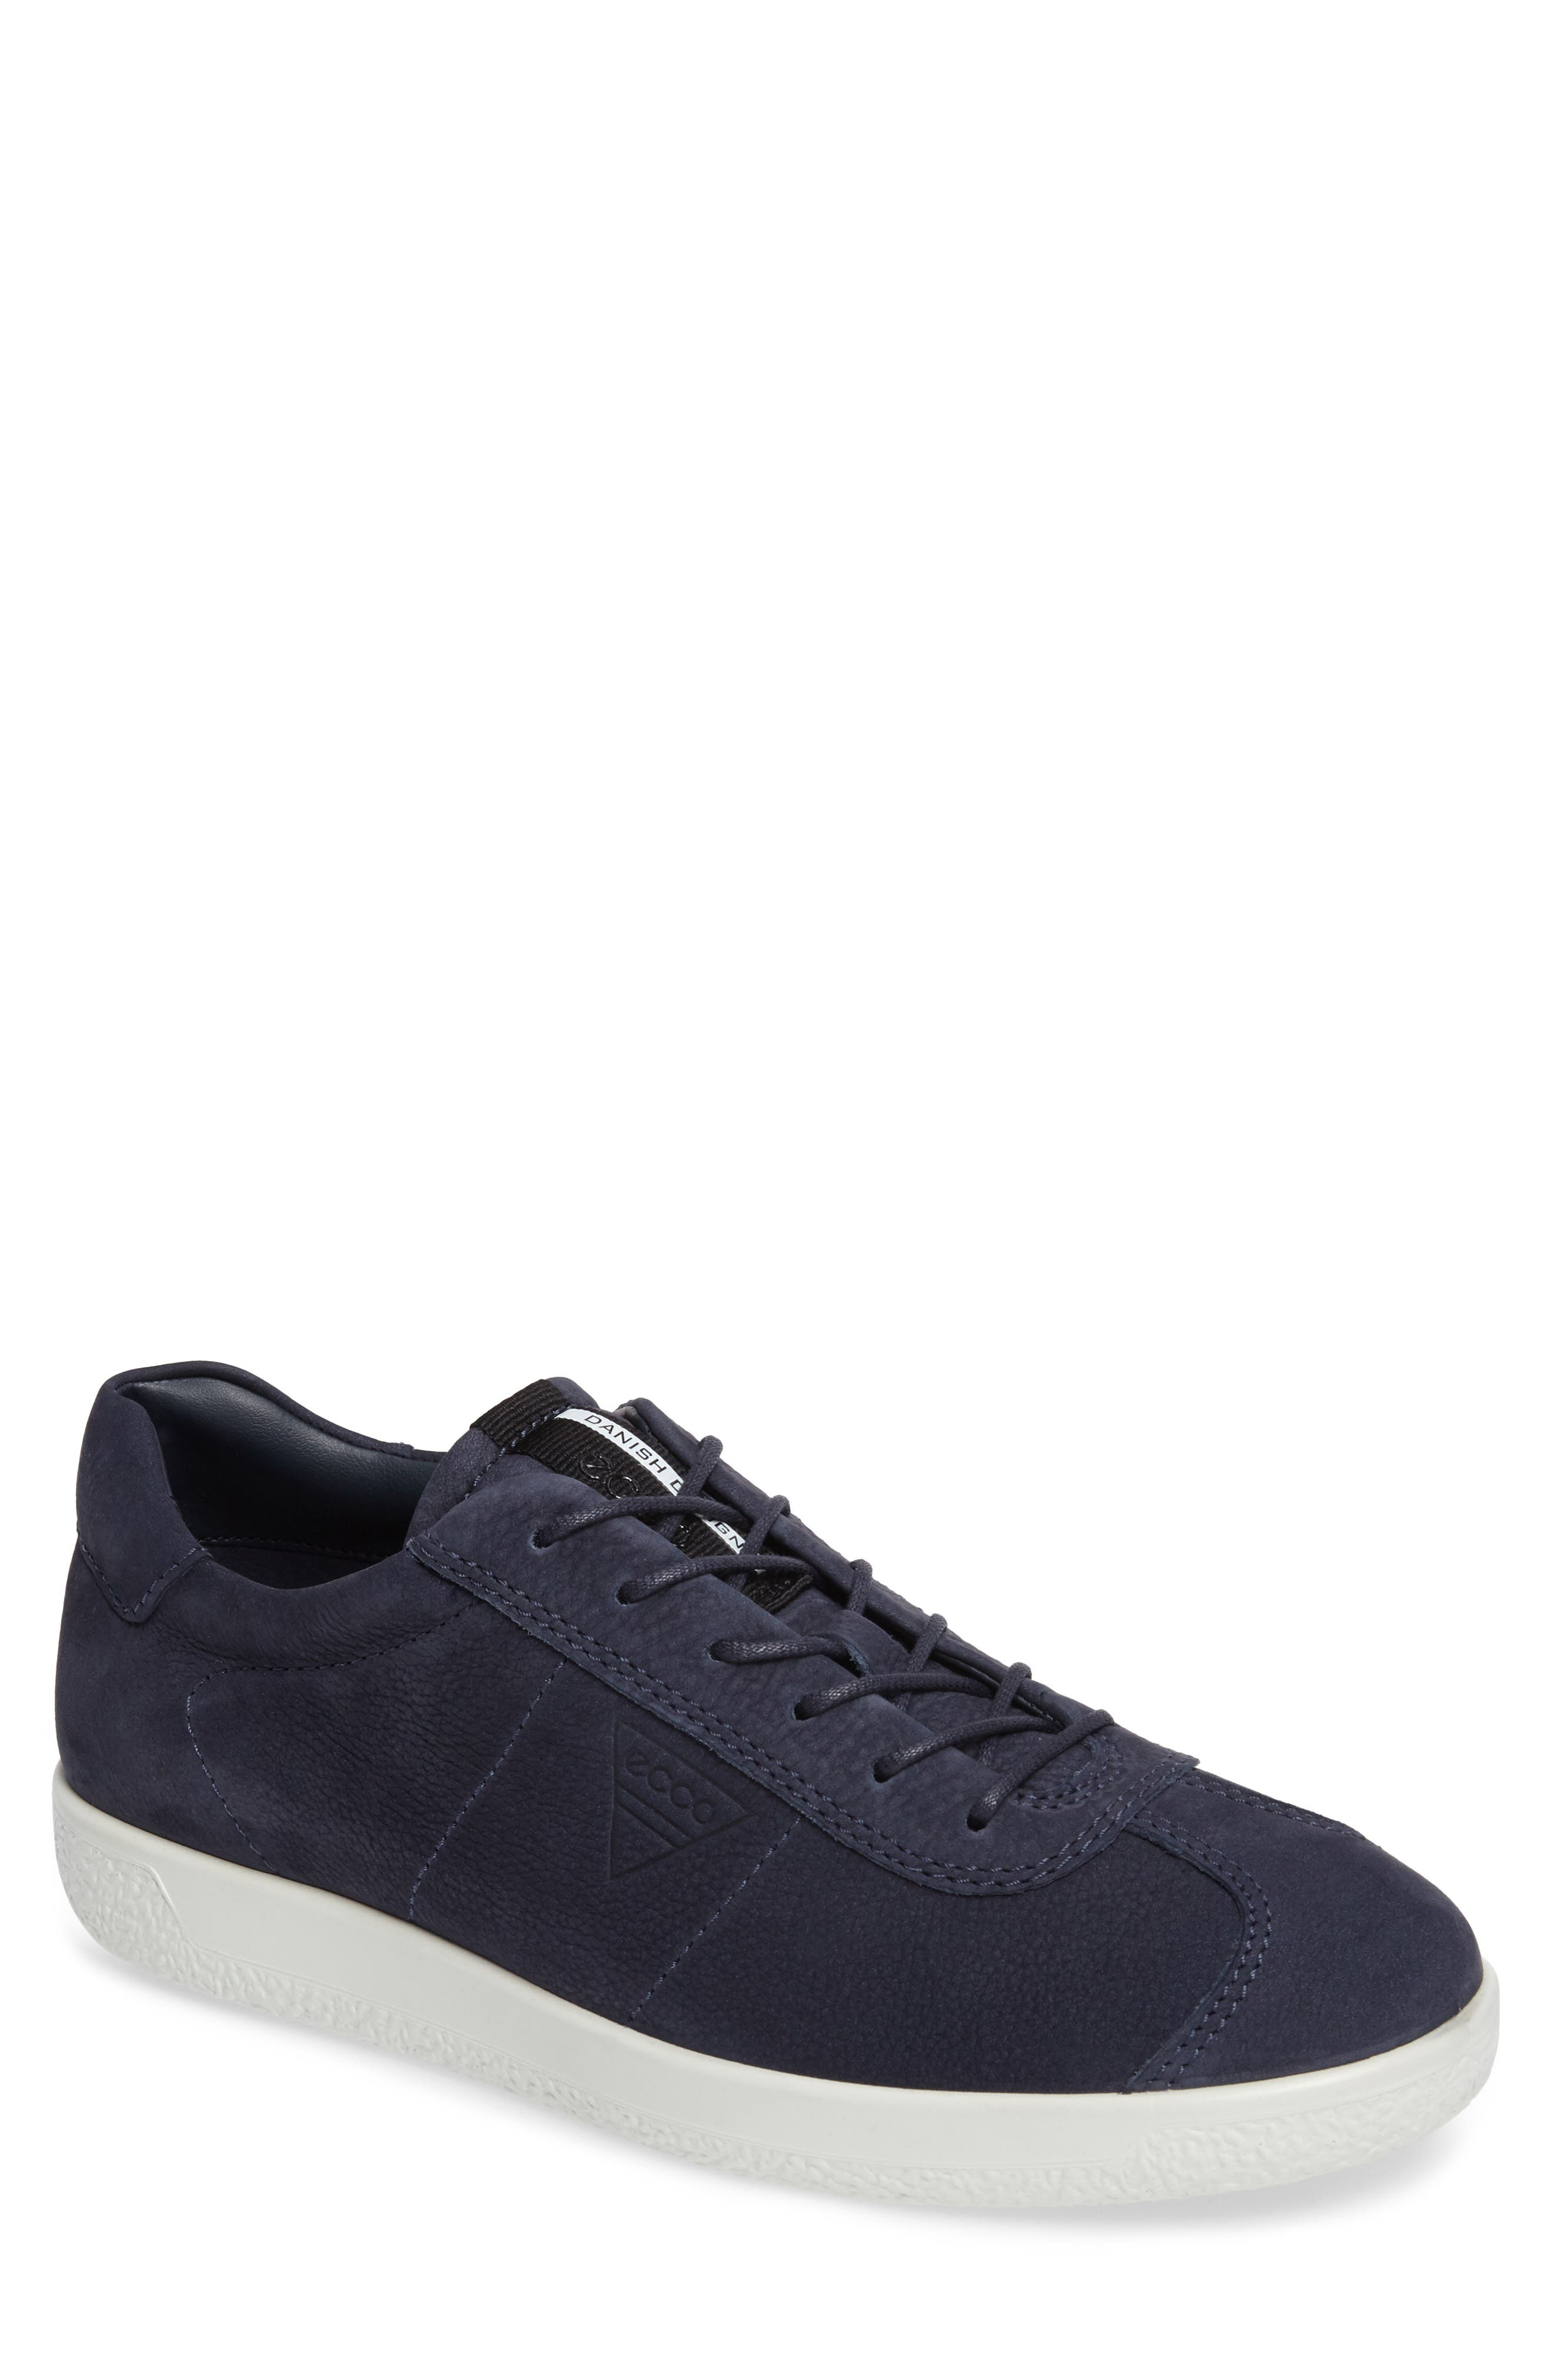 Alternate Image 1 Selected - ECCO Soft 1 Sneaker (Men)